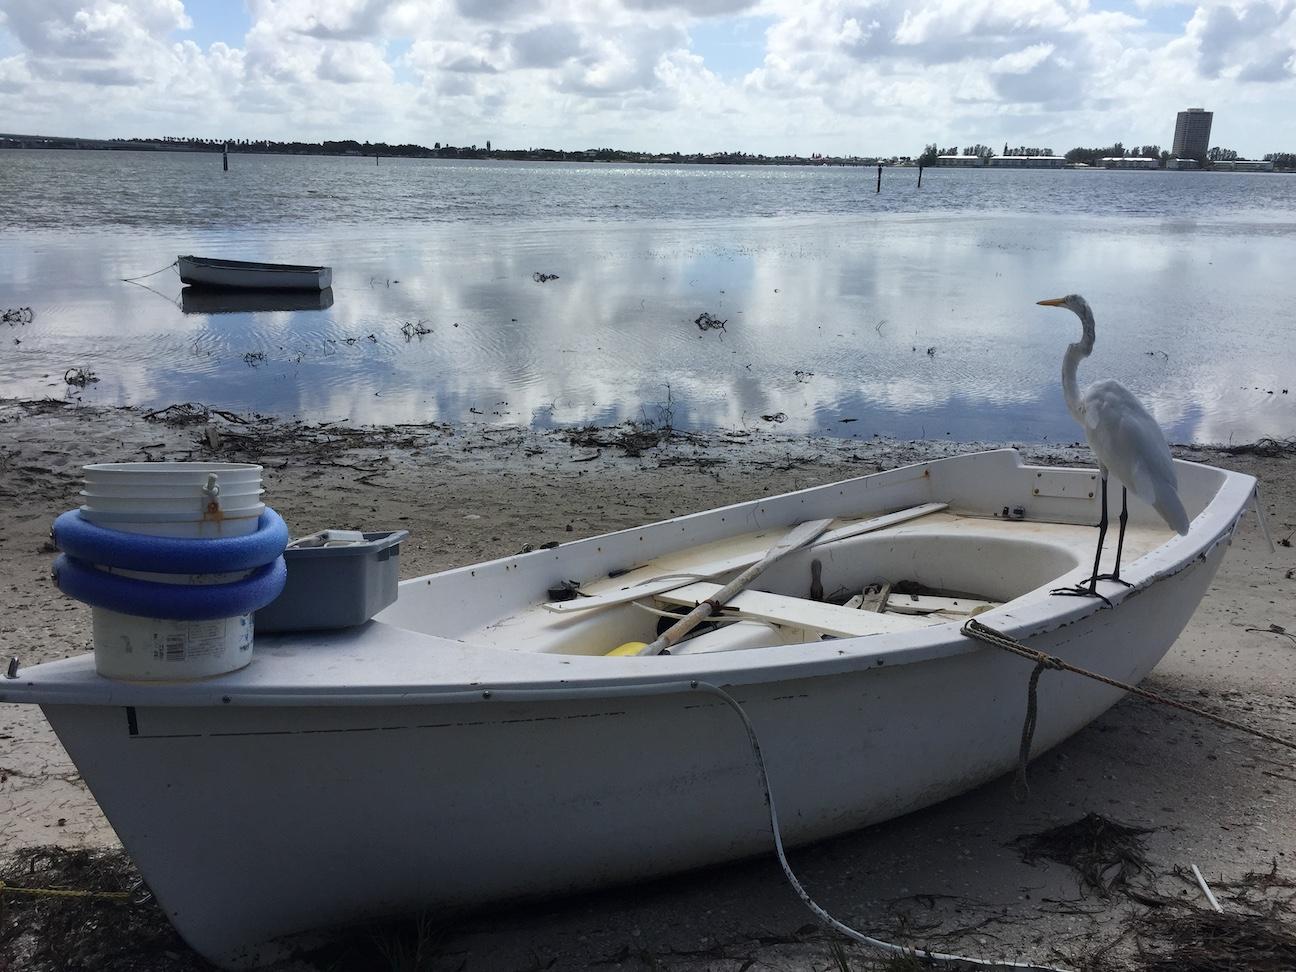 Bird sitting on small boat image